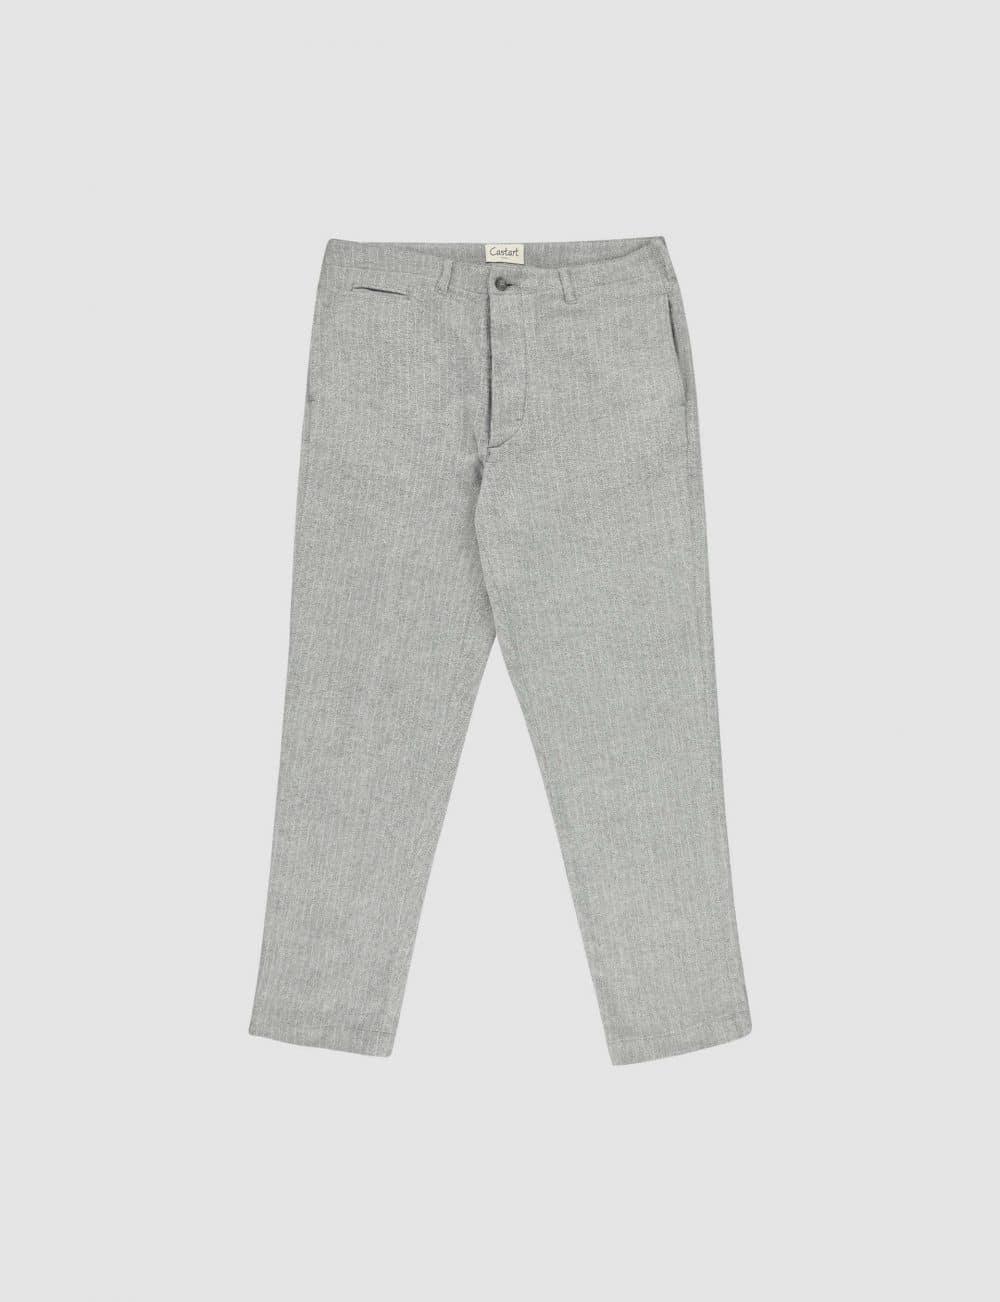 Wilden - Middle Grey